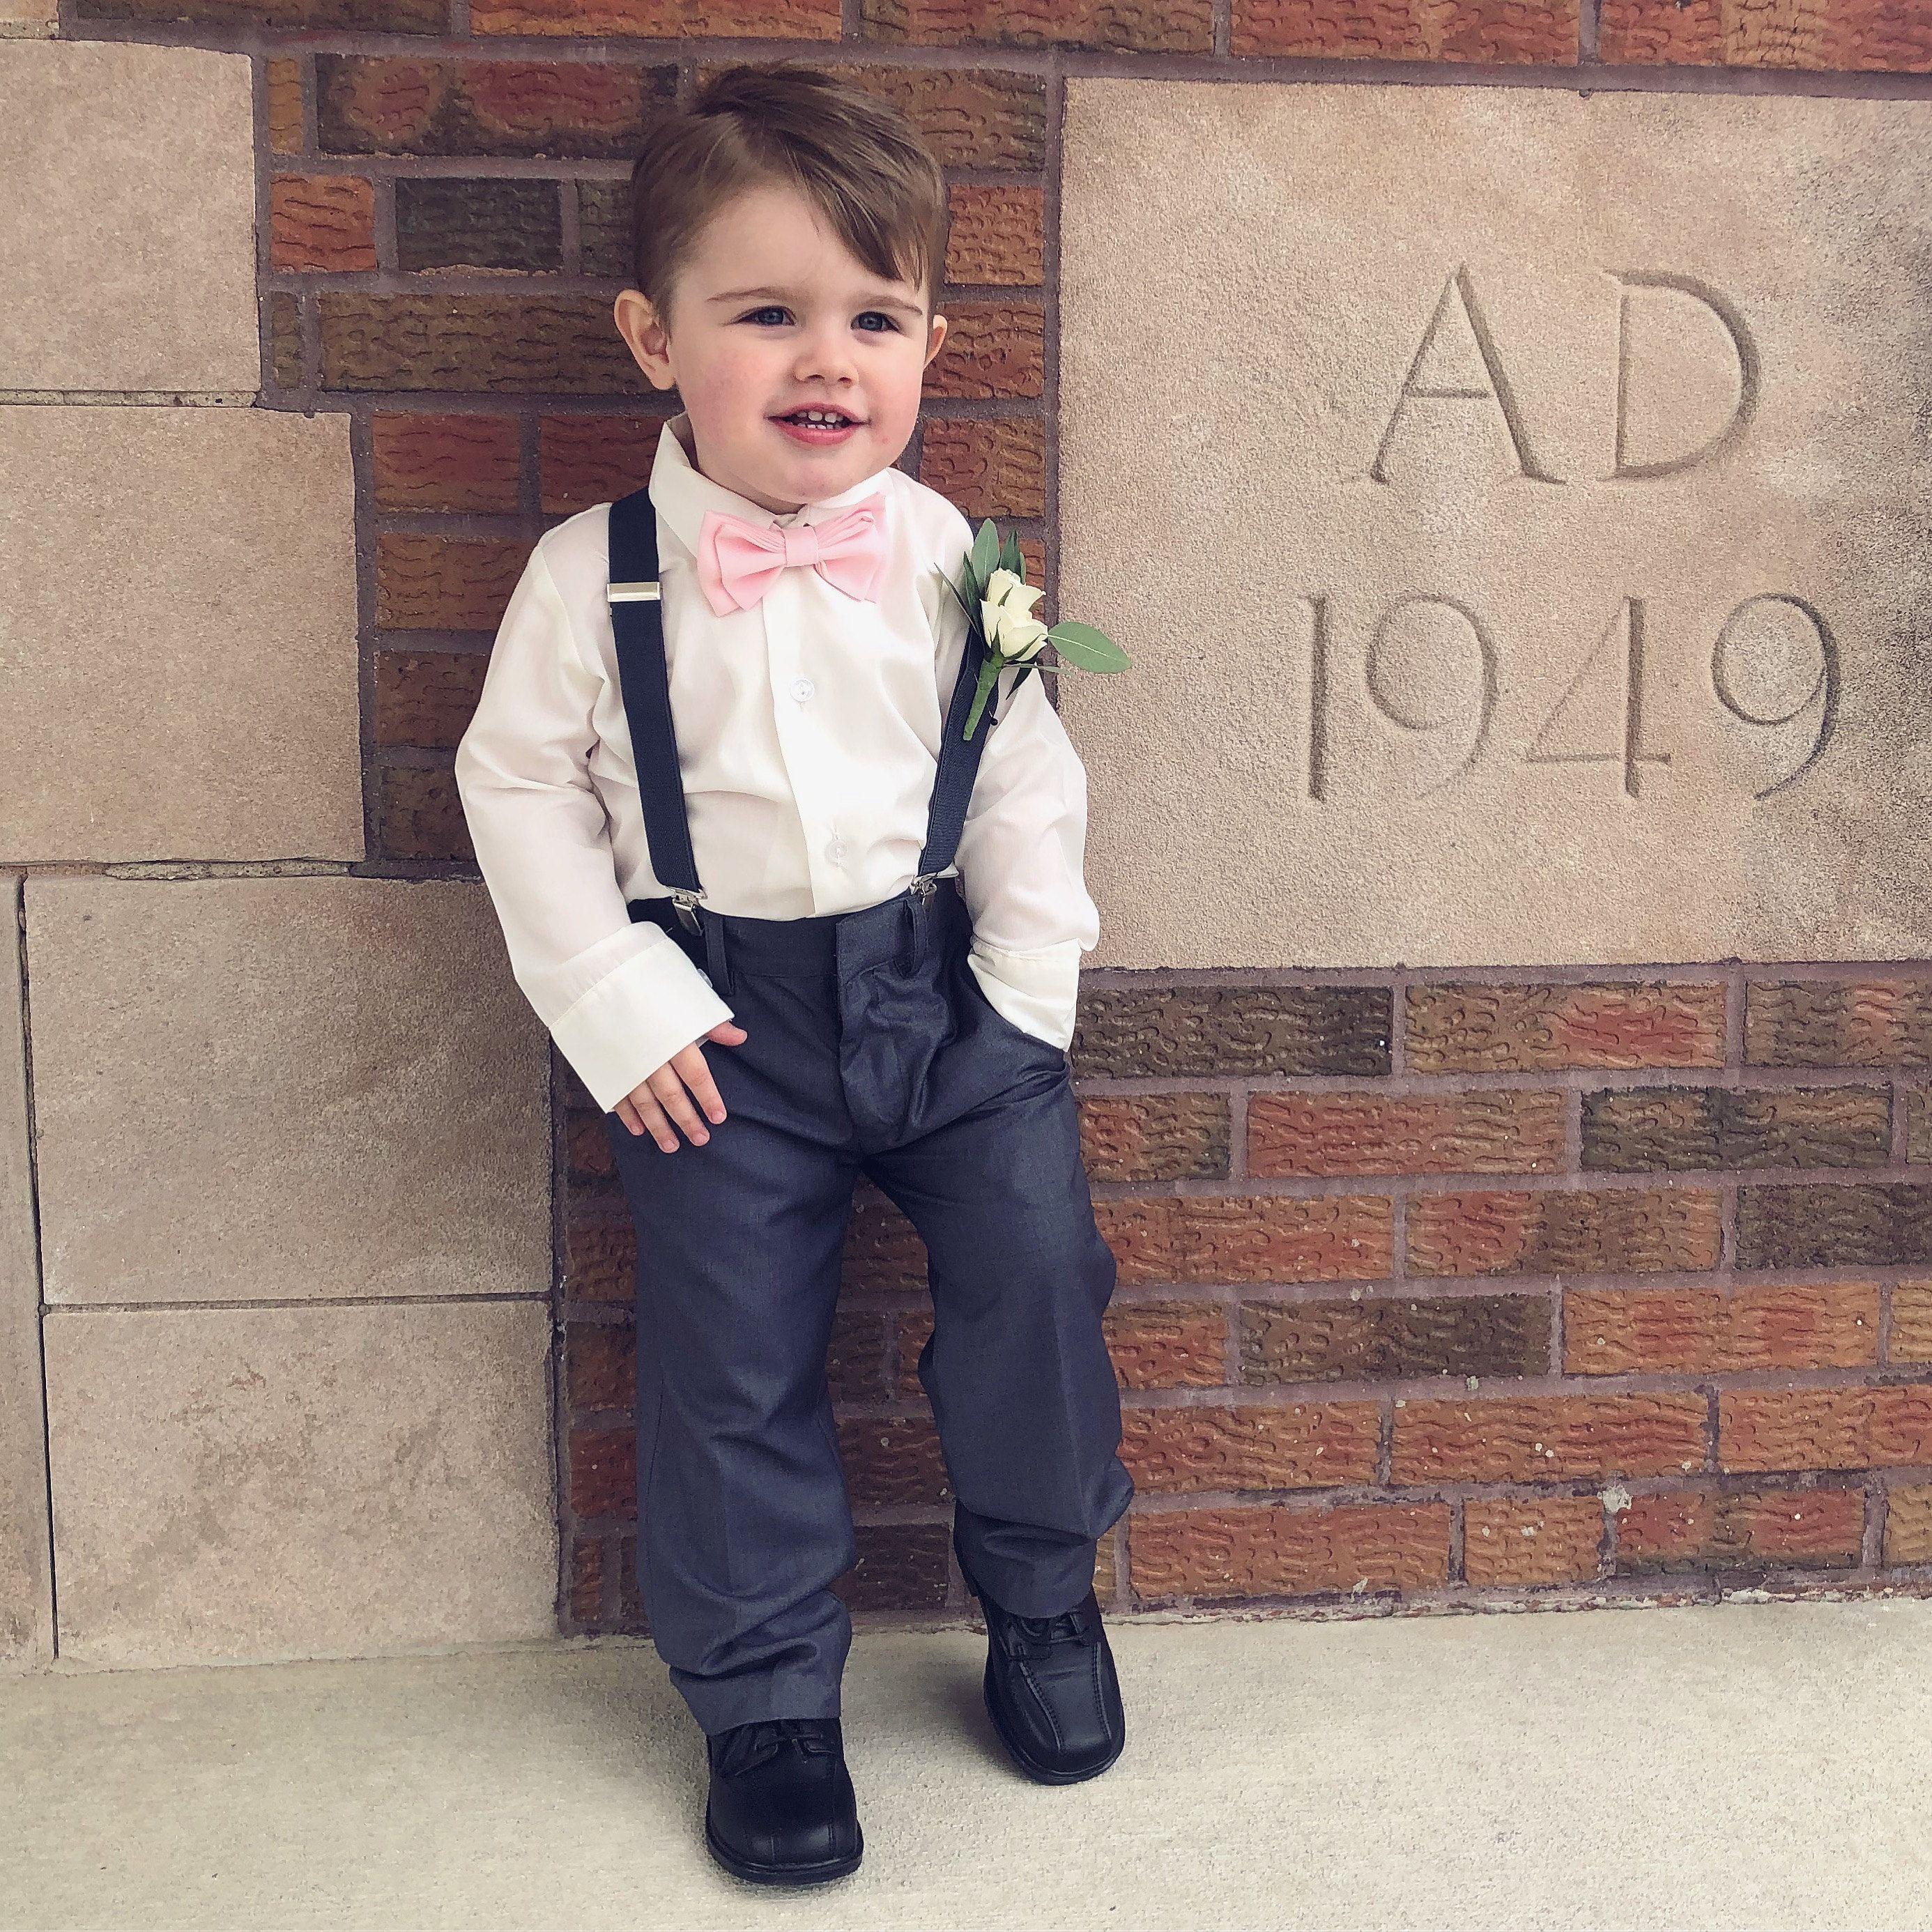 Blush Bow Tie Bow Tie /& Suspenders Ring Bearer Outfit Blush Toddler Bow Tie Pink Bow Tie Blush Baby Bow Tie Wedding Suspenders